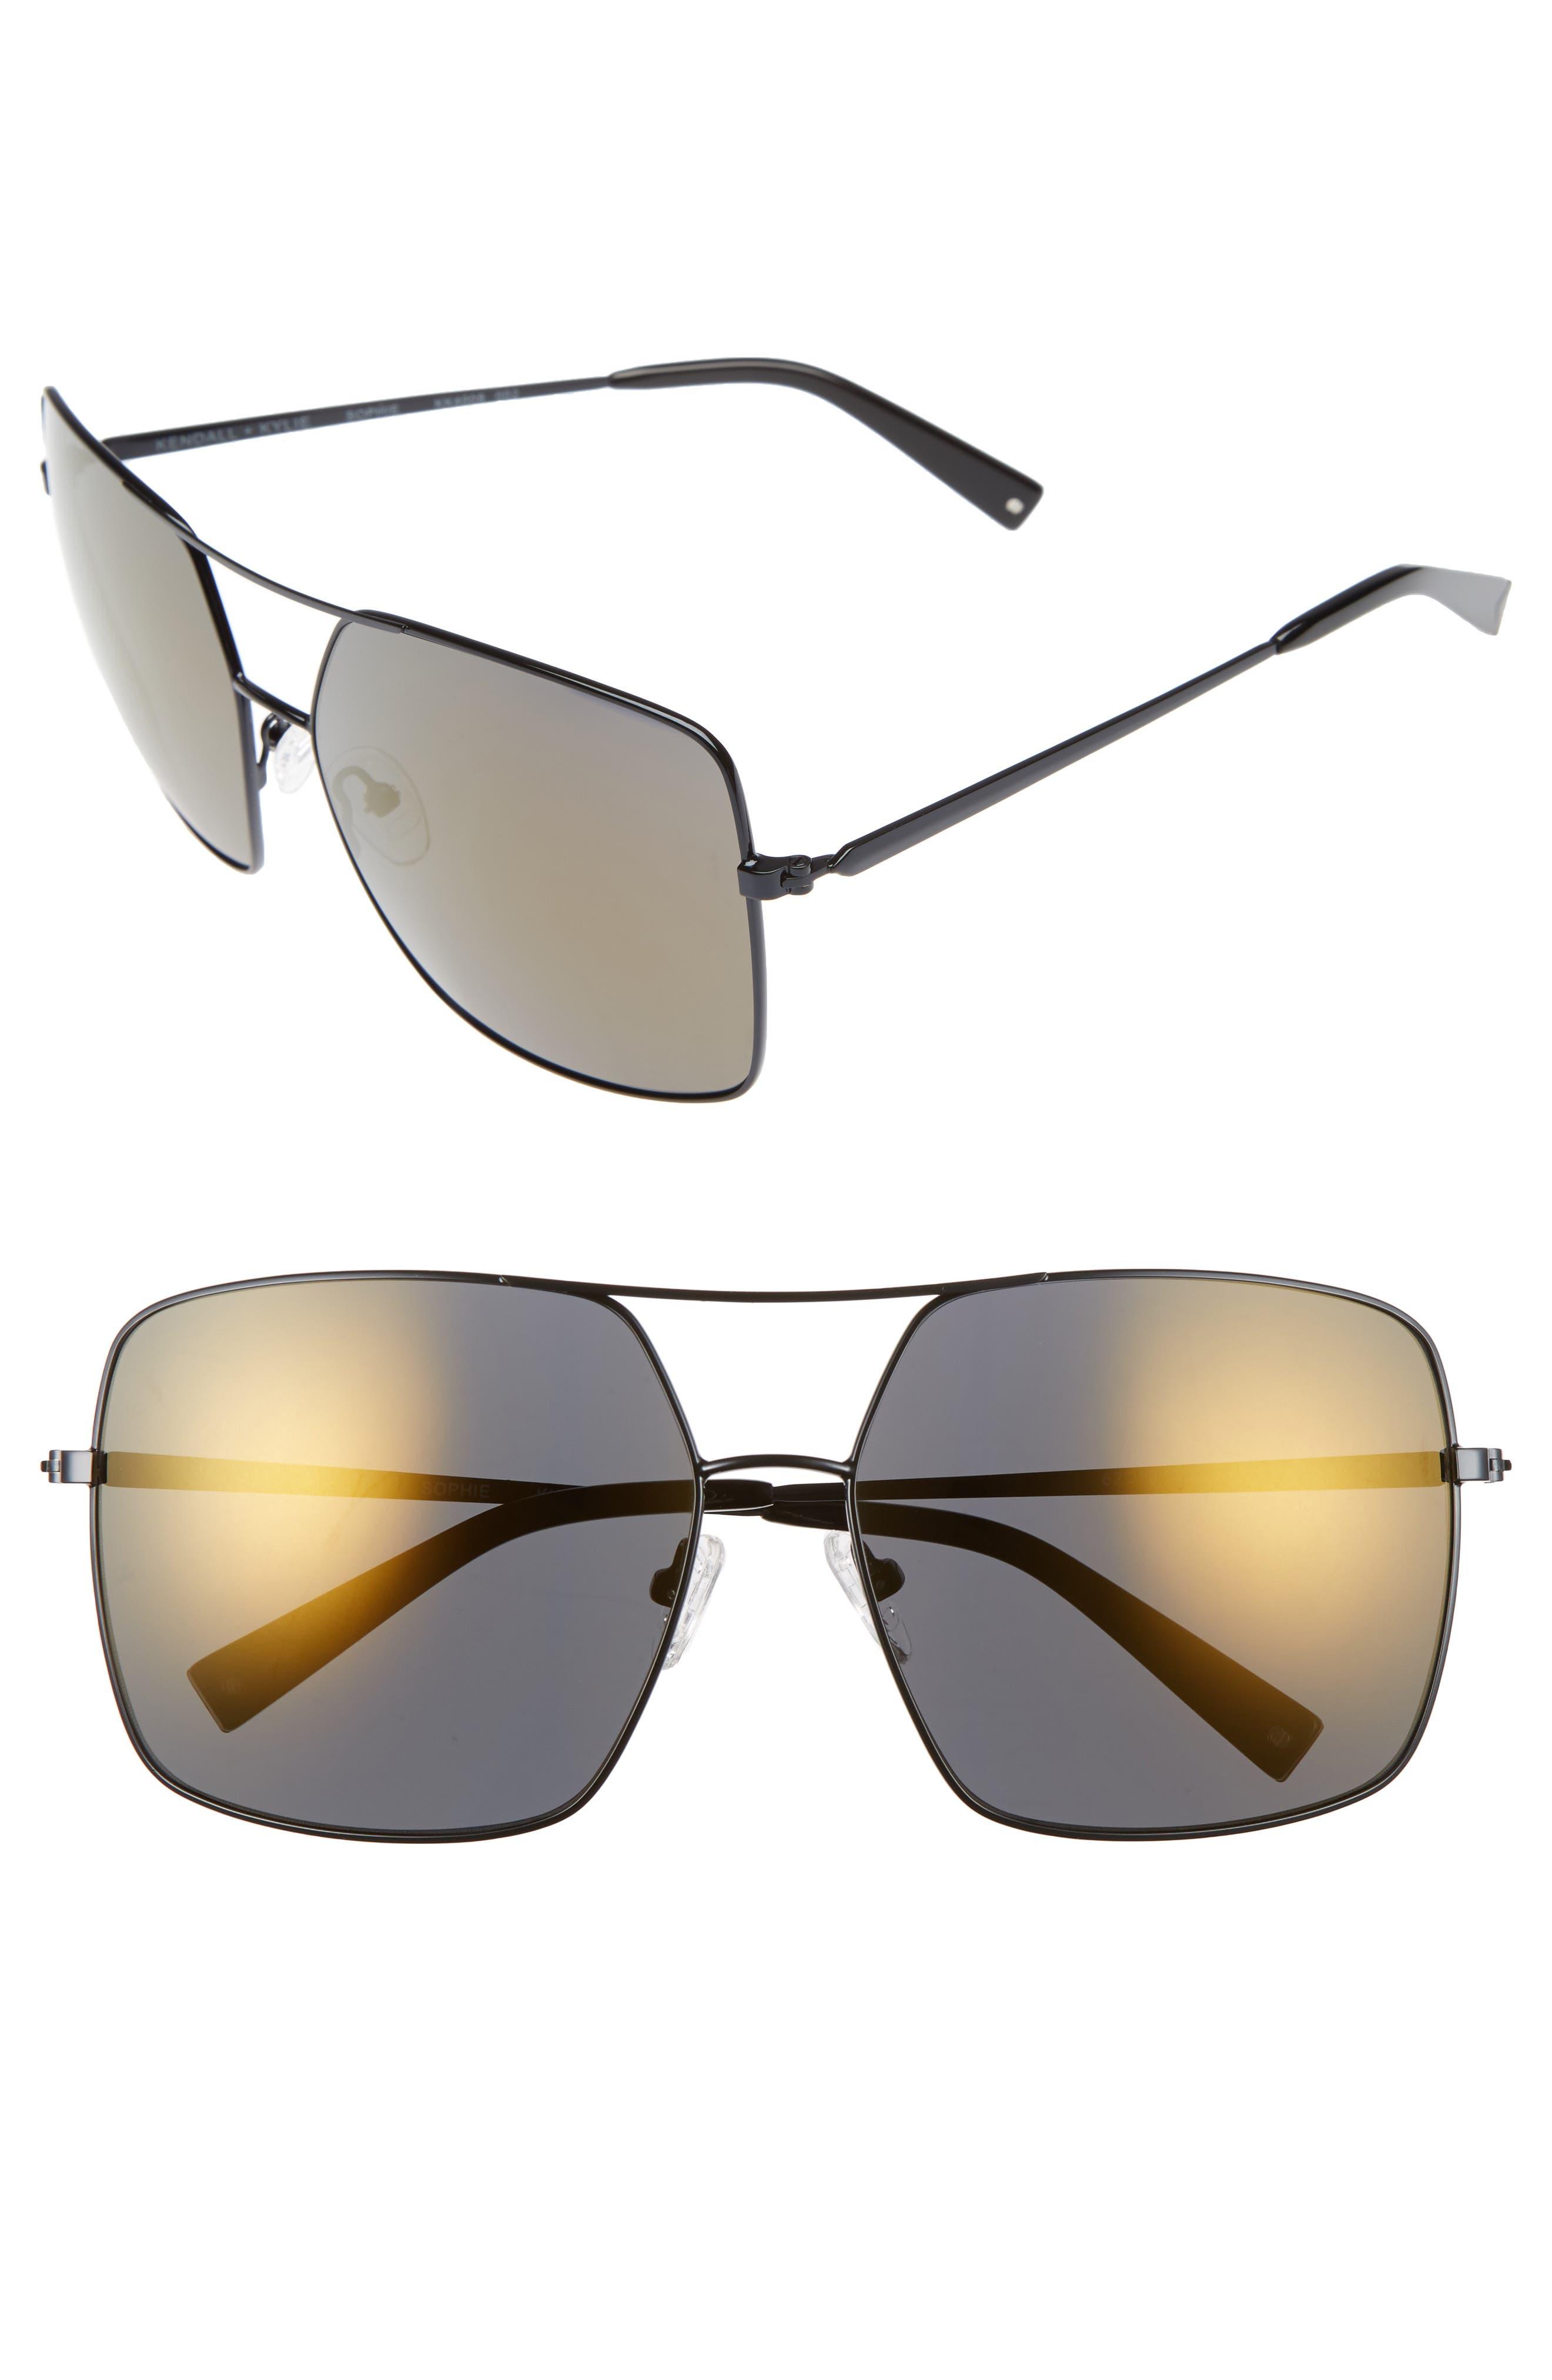 65mm Navigator Sunglasses,                             Main thumbnail 1, color,                             001